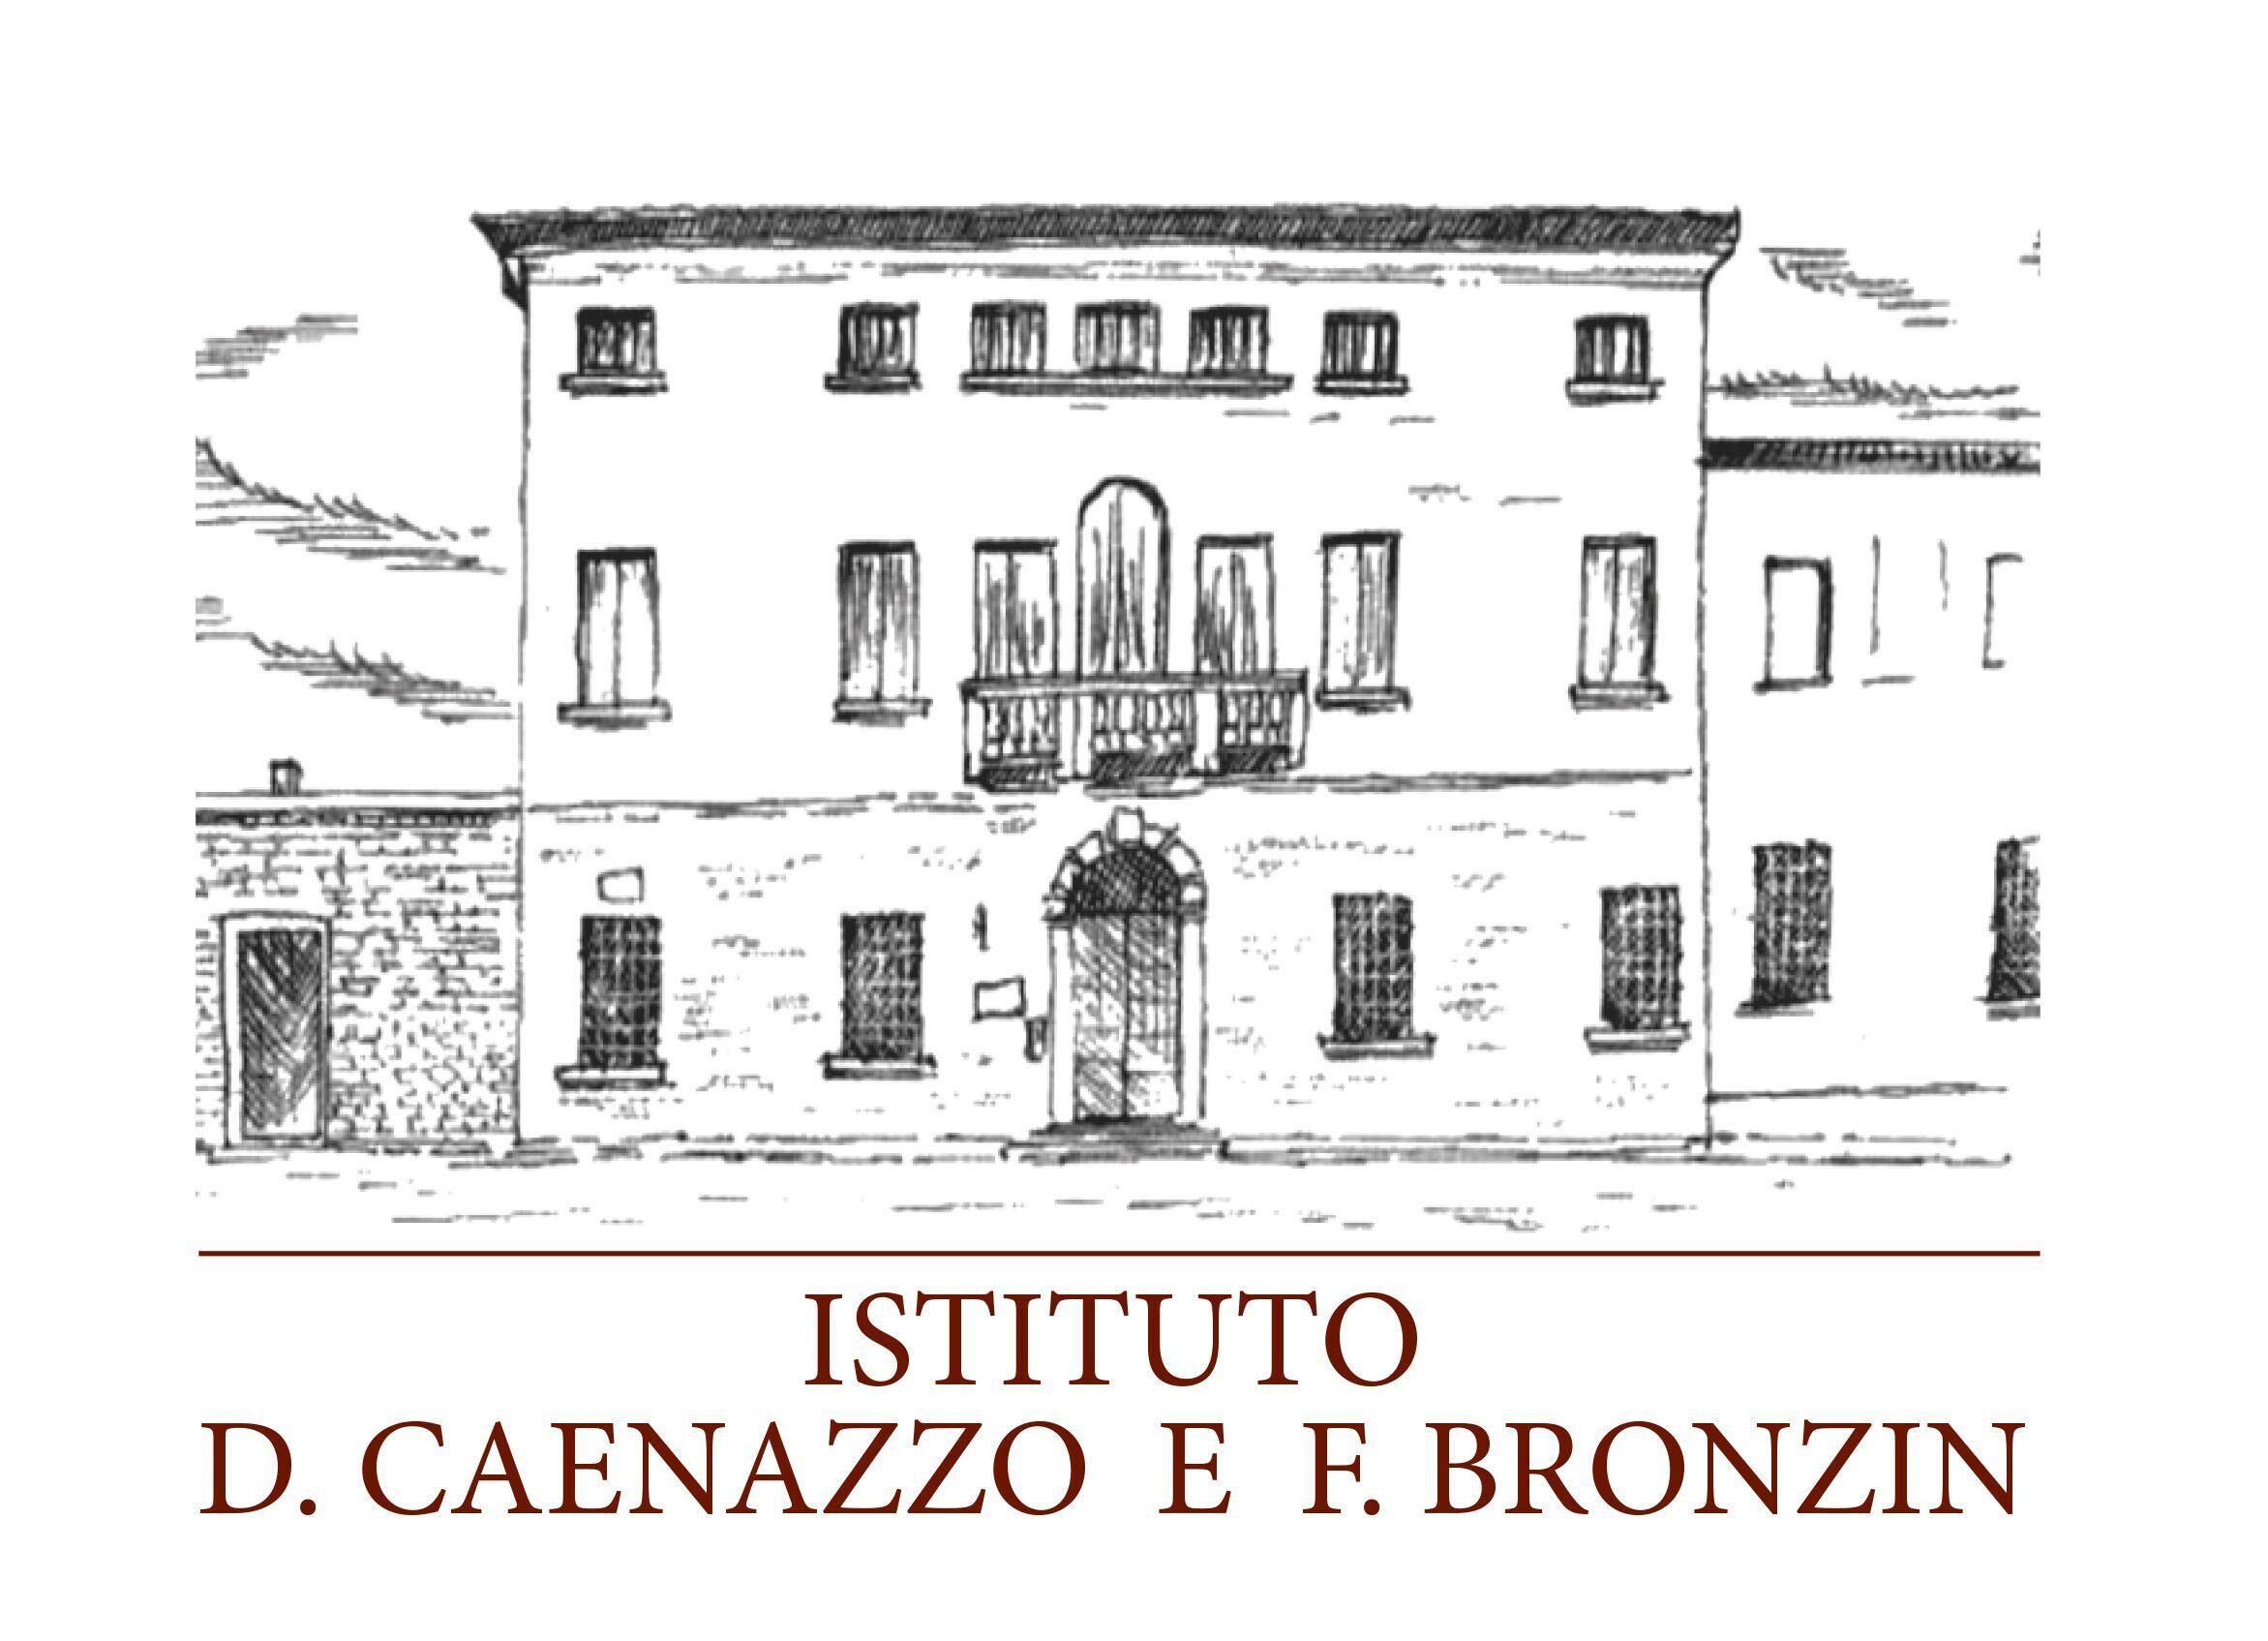 Istituto Caenazzo Bronzin